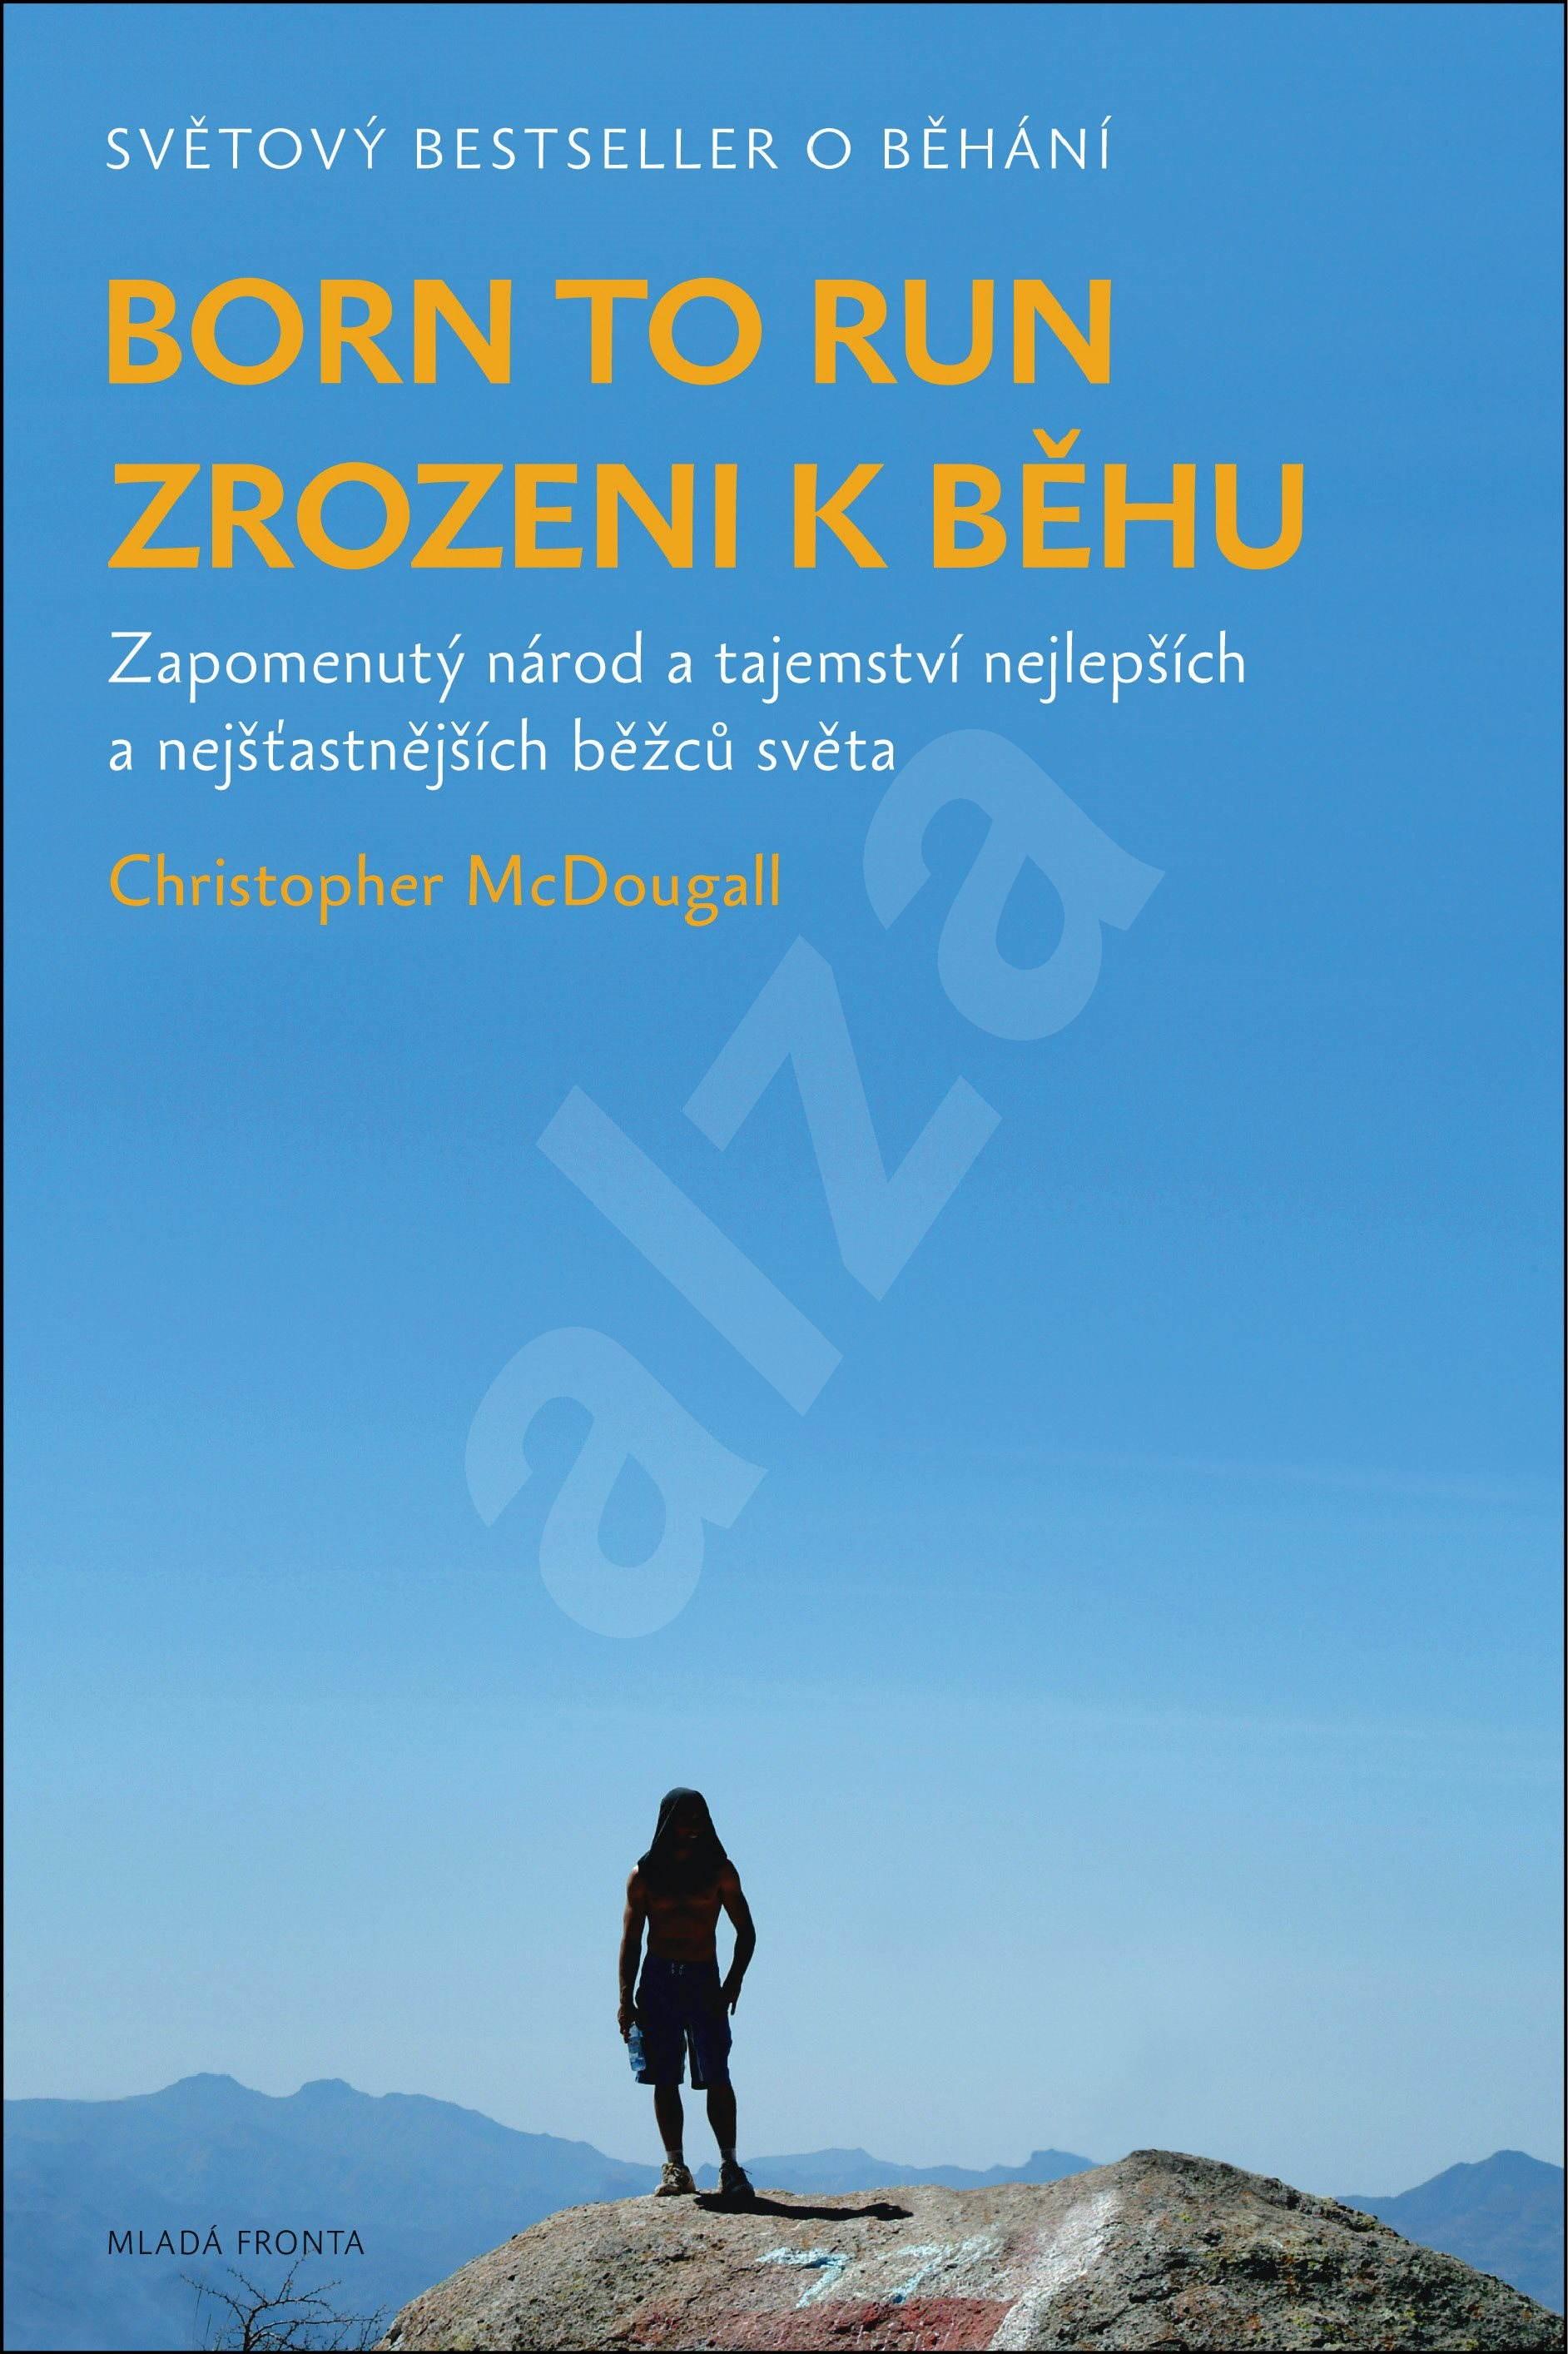 Kniha Born to run - Zrozeni k běhu (Christopher McDougall)